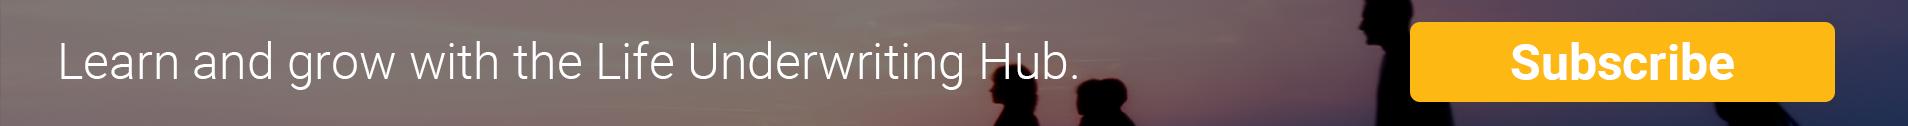 Subscribe to RGAX Life Underwriting Hub